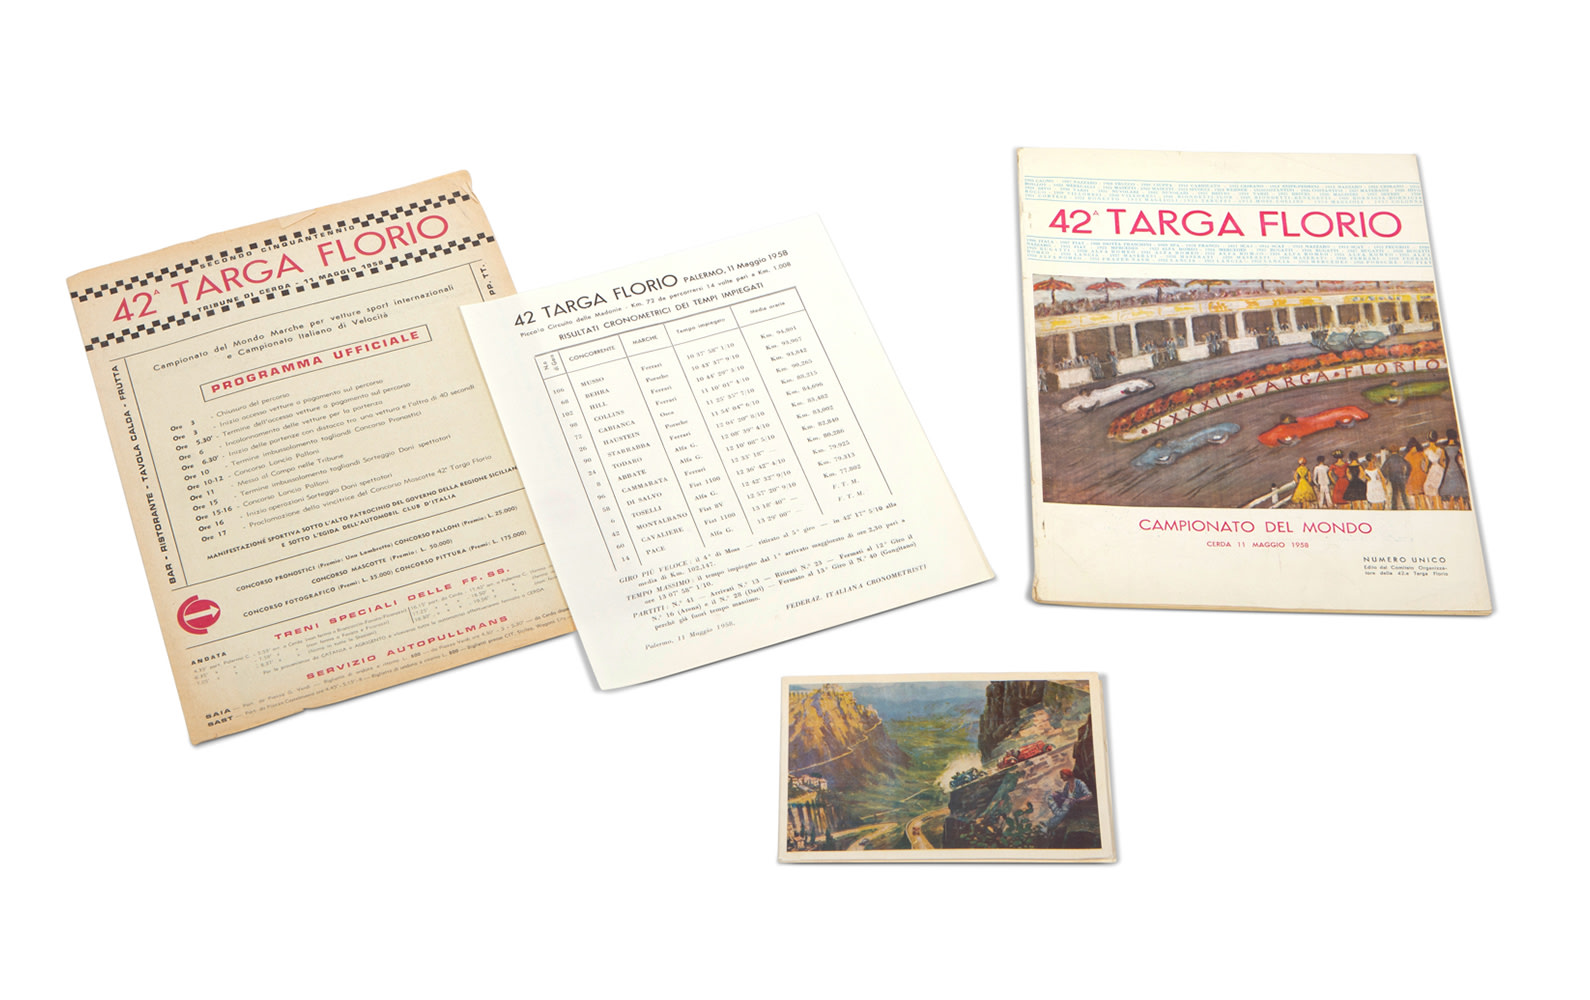 1958 Targa Florio New Year's Card, Official Race Program, and Entry List